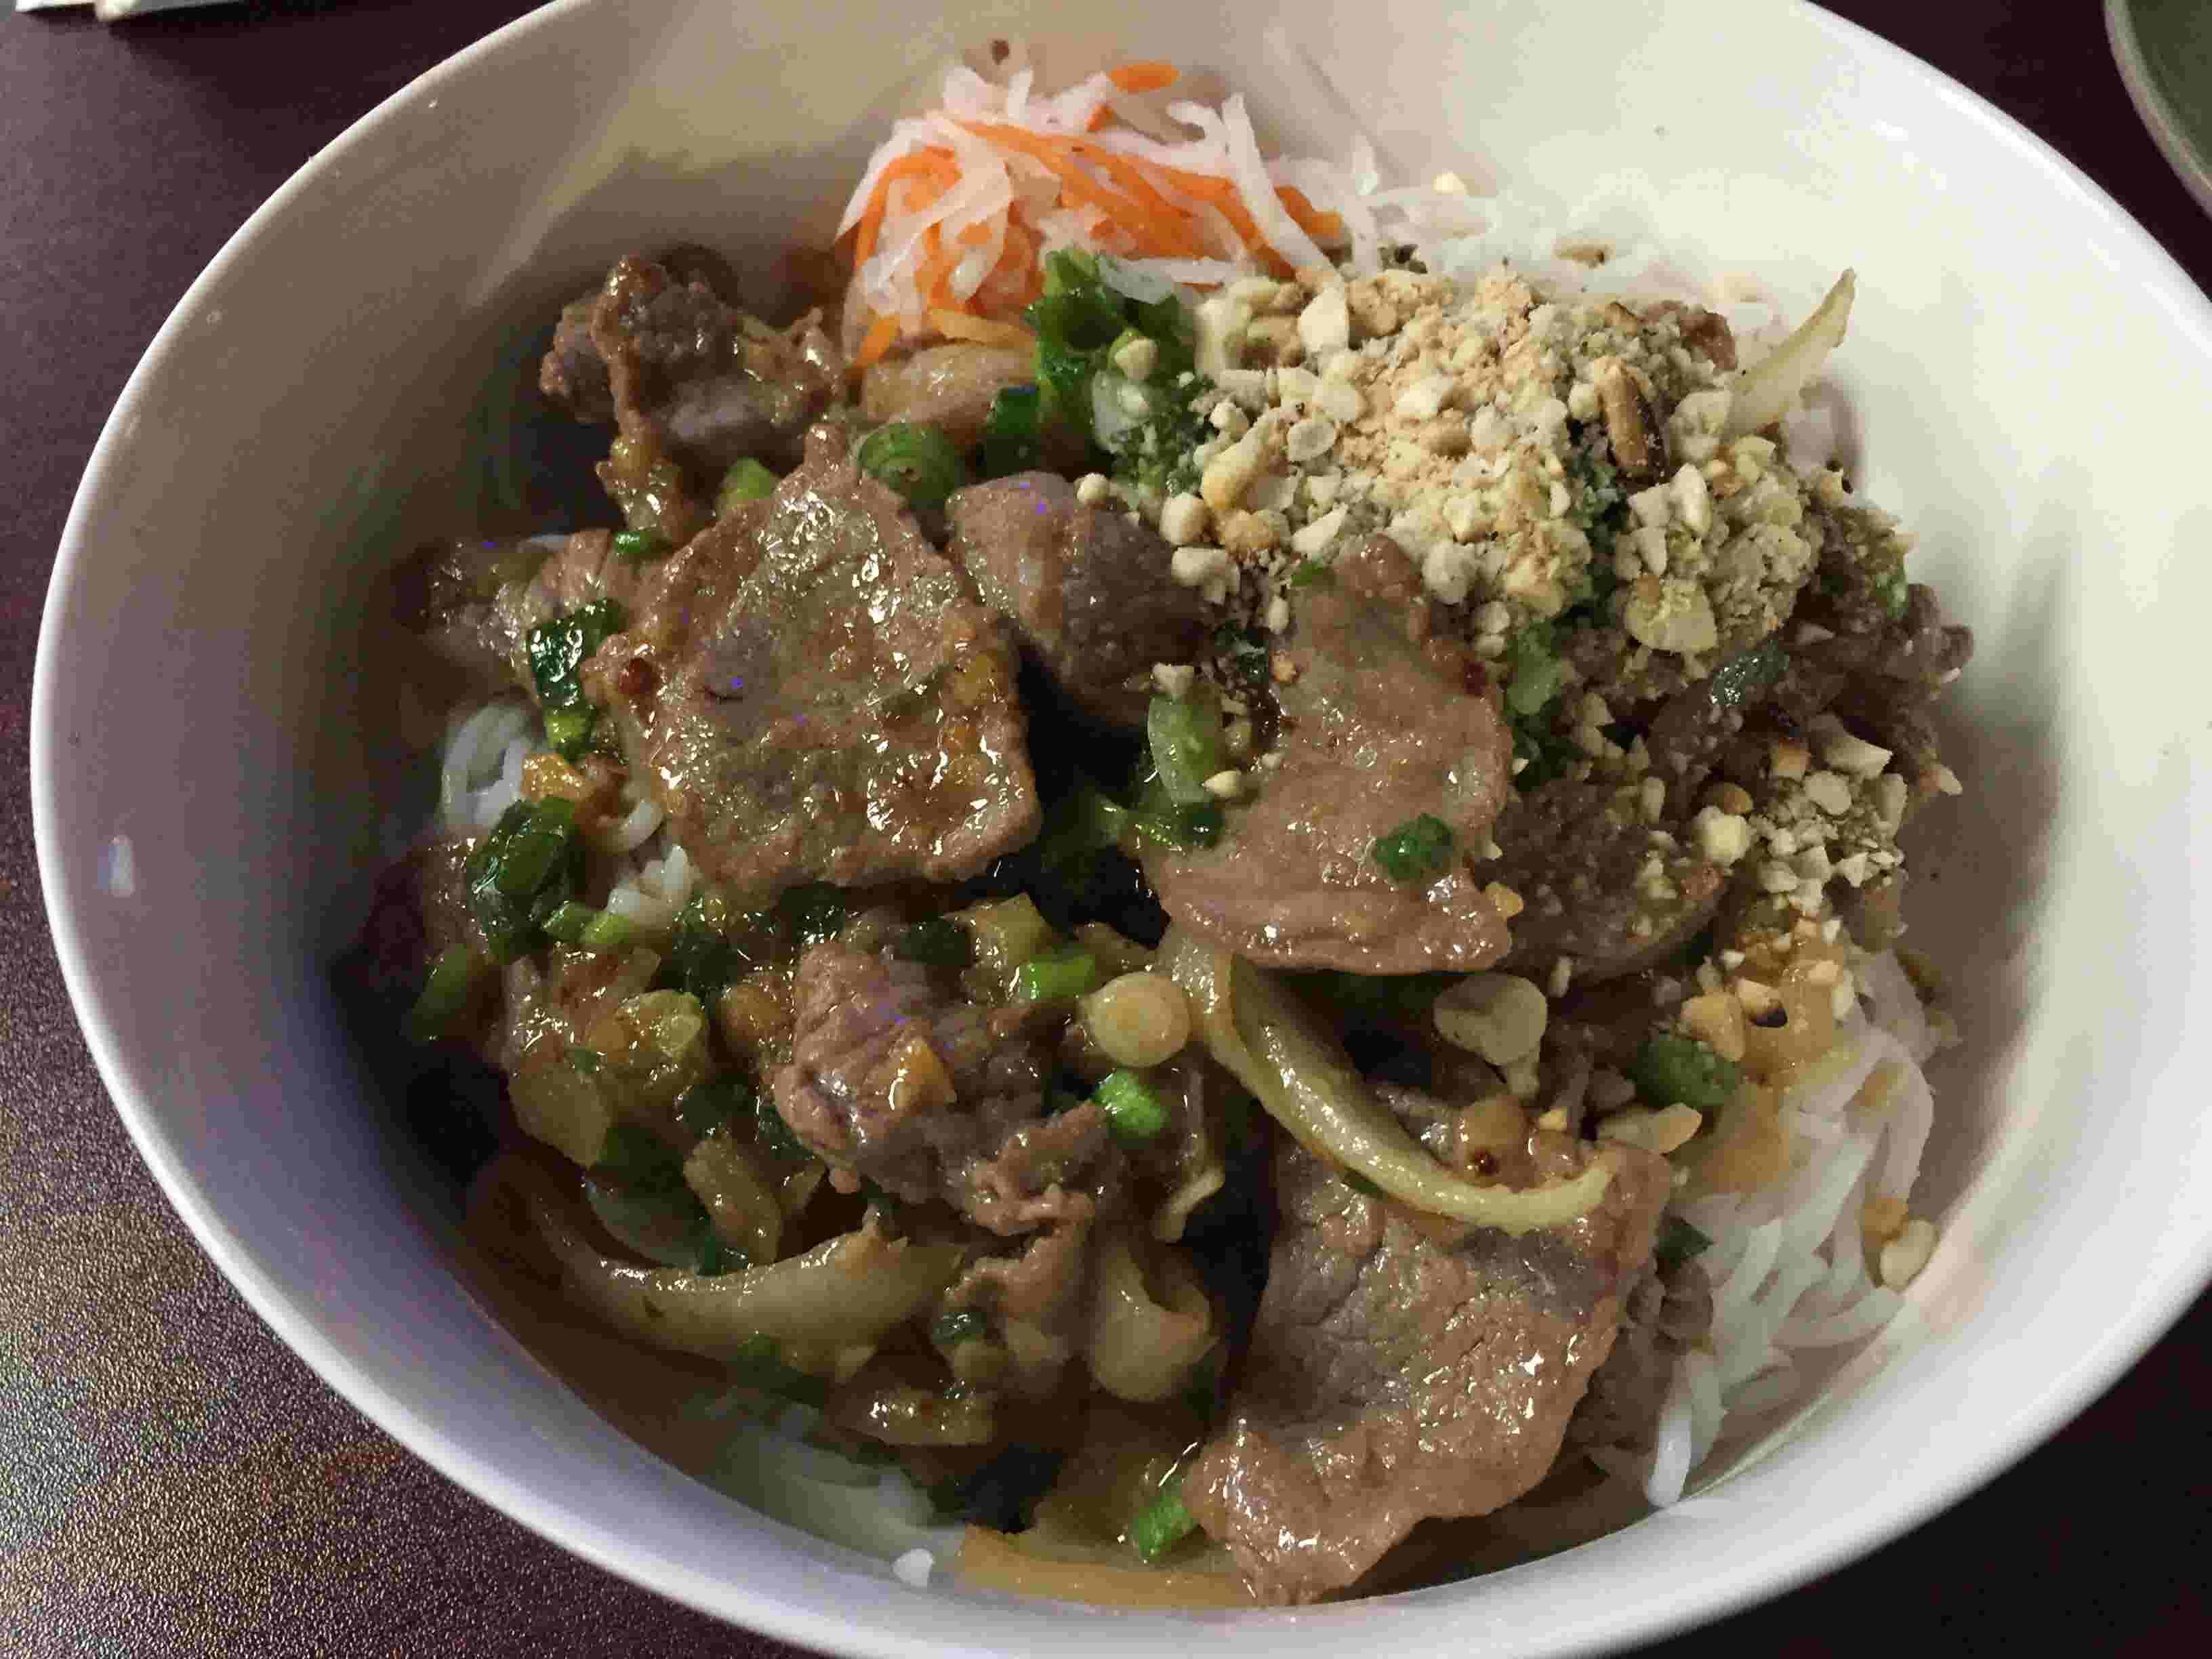 Saigon Kitchen provides 'taste of real Vietnamese food' in Burlington